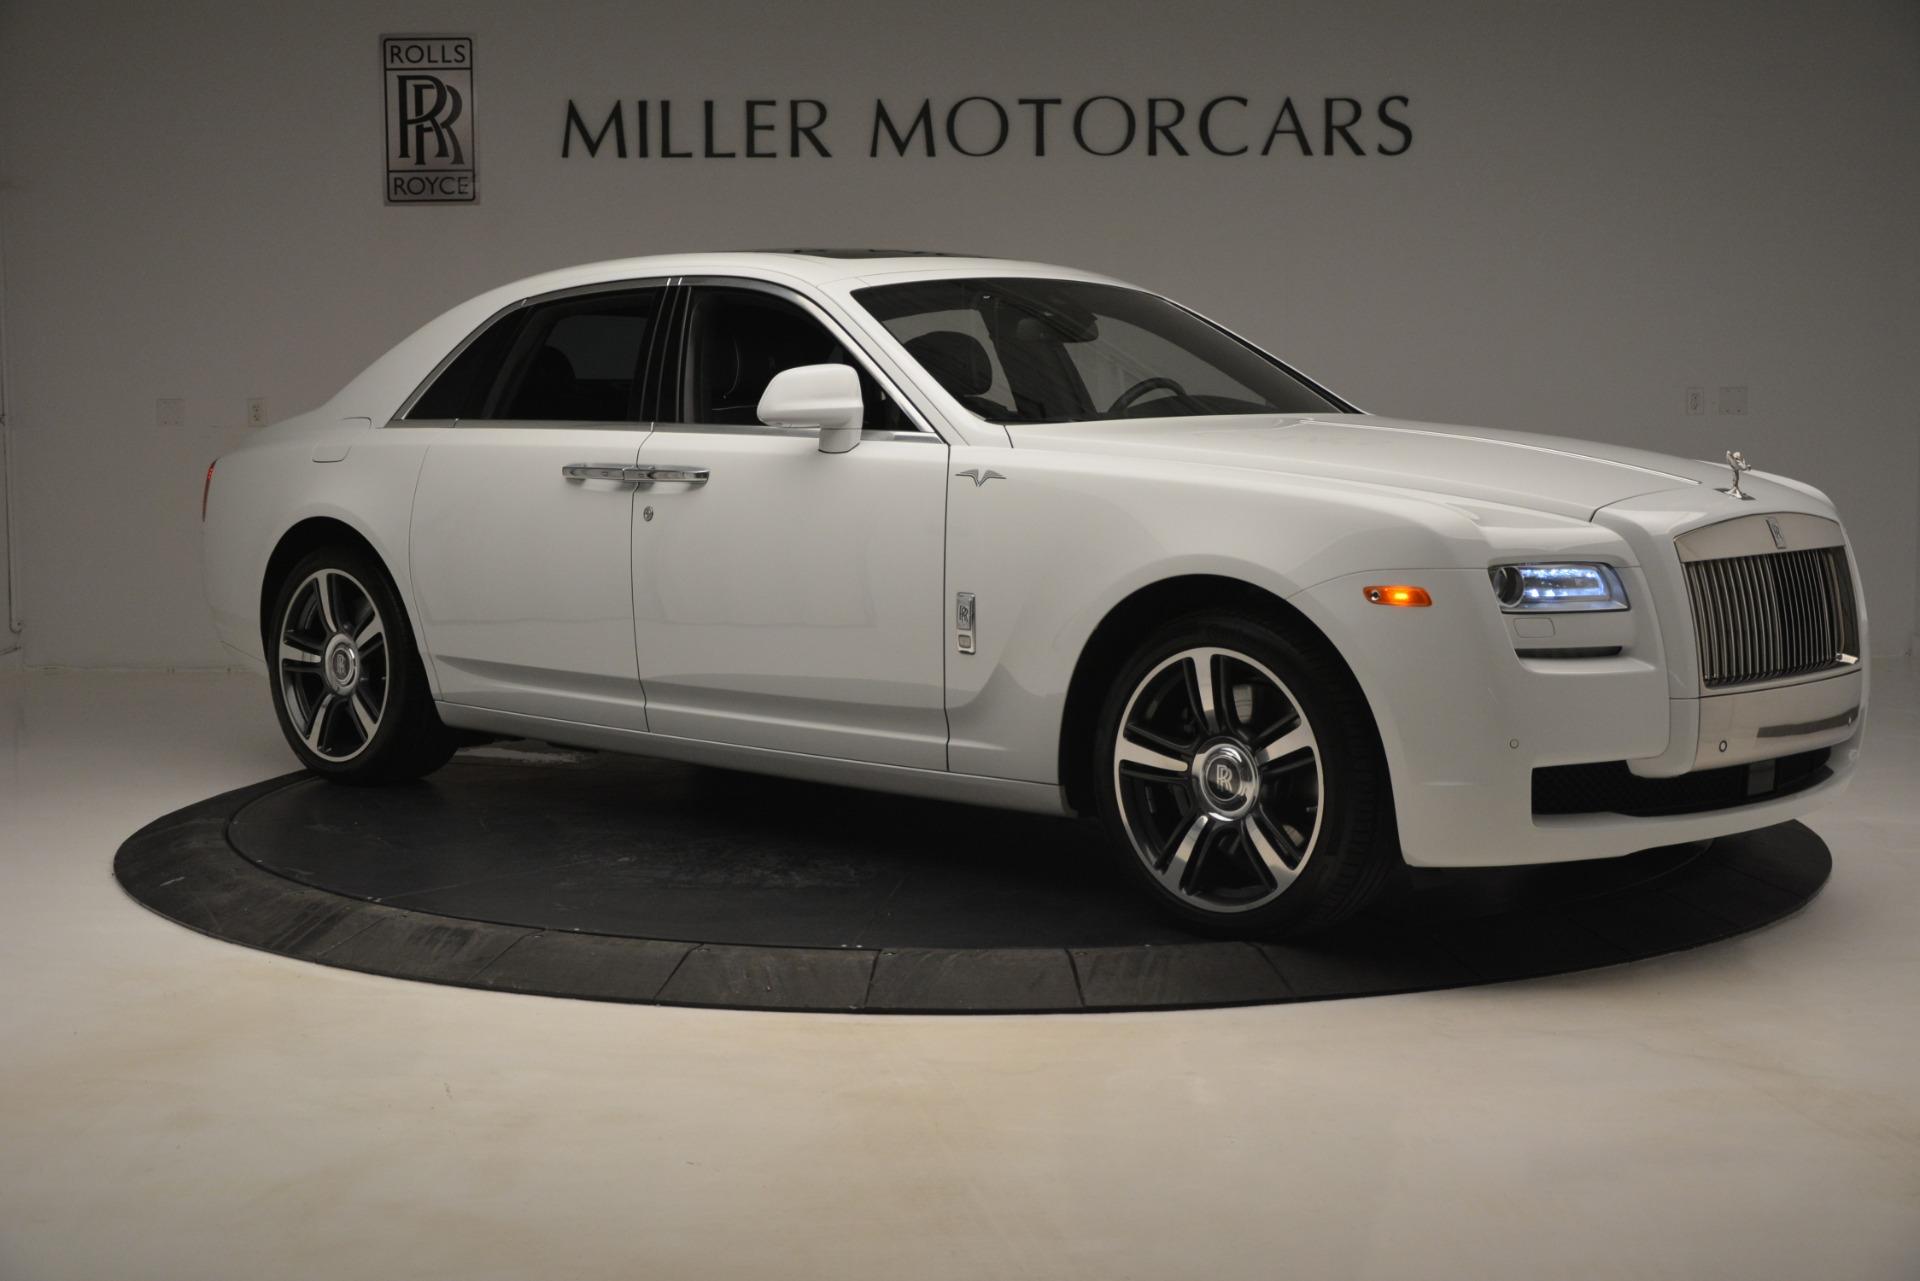 Used 2014 Rolls-Royce Ghost V-Spec For Sale In Westport, CT 2989_p12